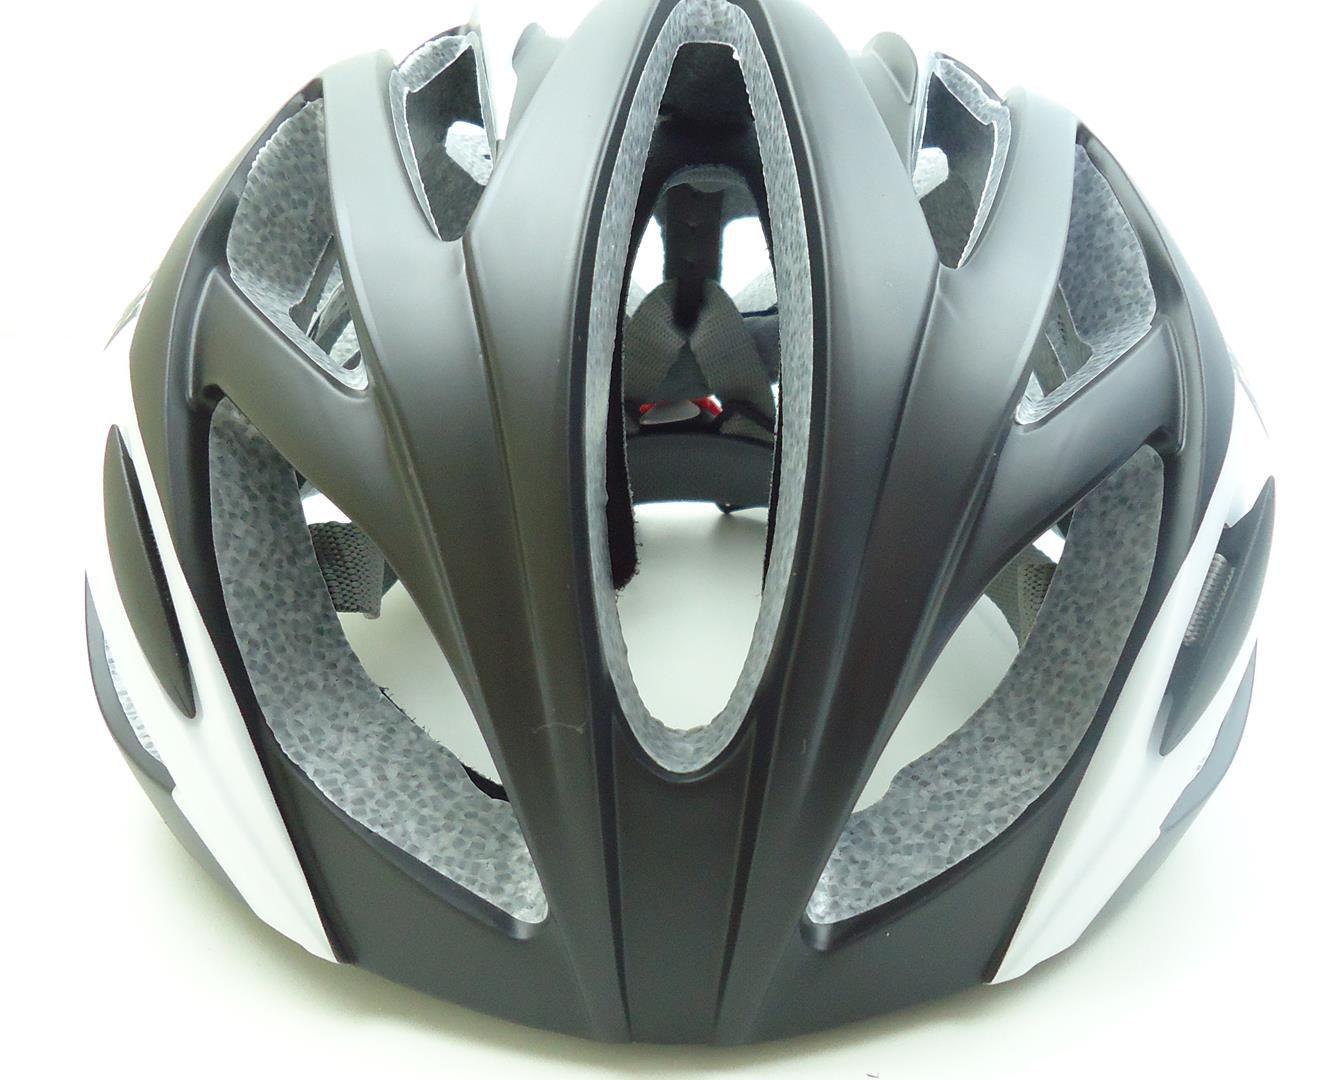 Capacete Bicicleta Argon TA-18 Tamanho G 57-62cm Speed ou MTB com LED